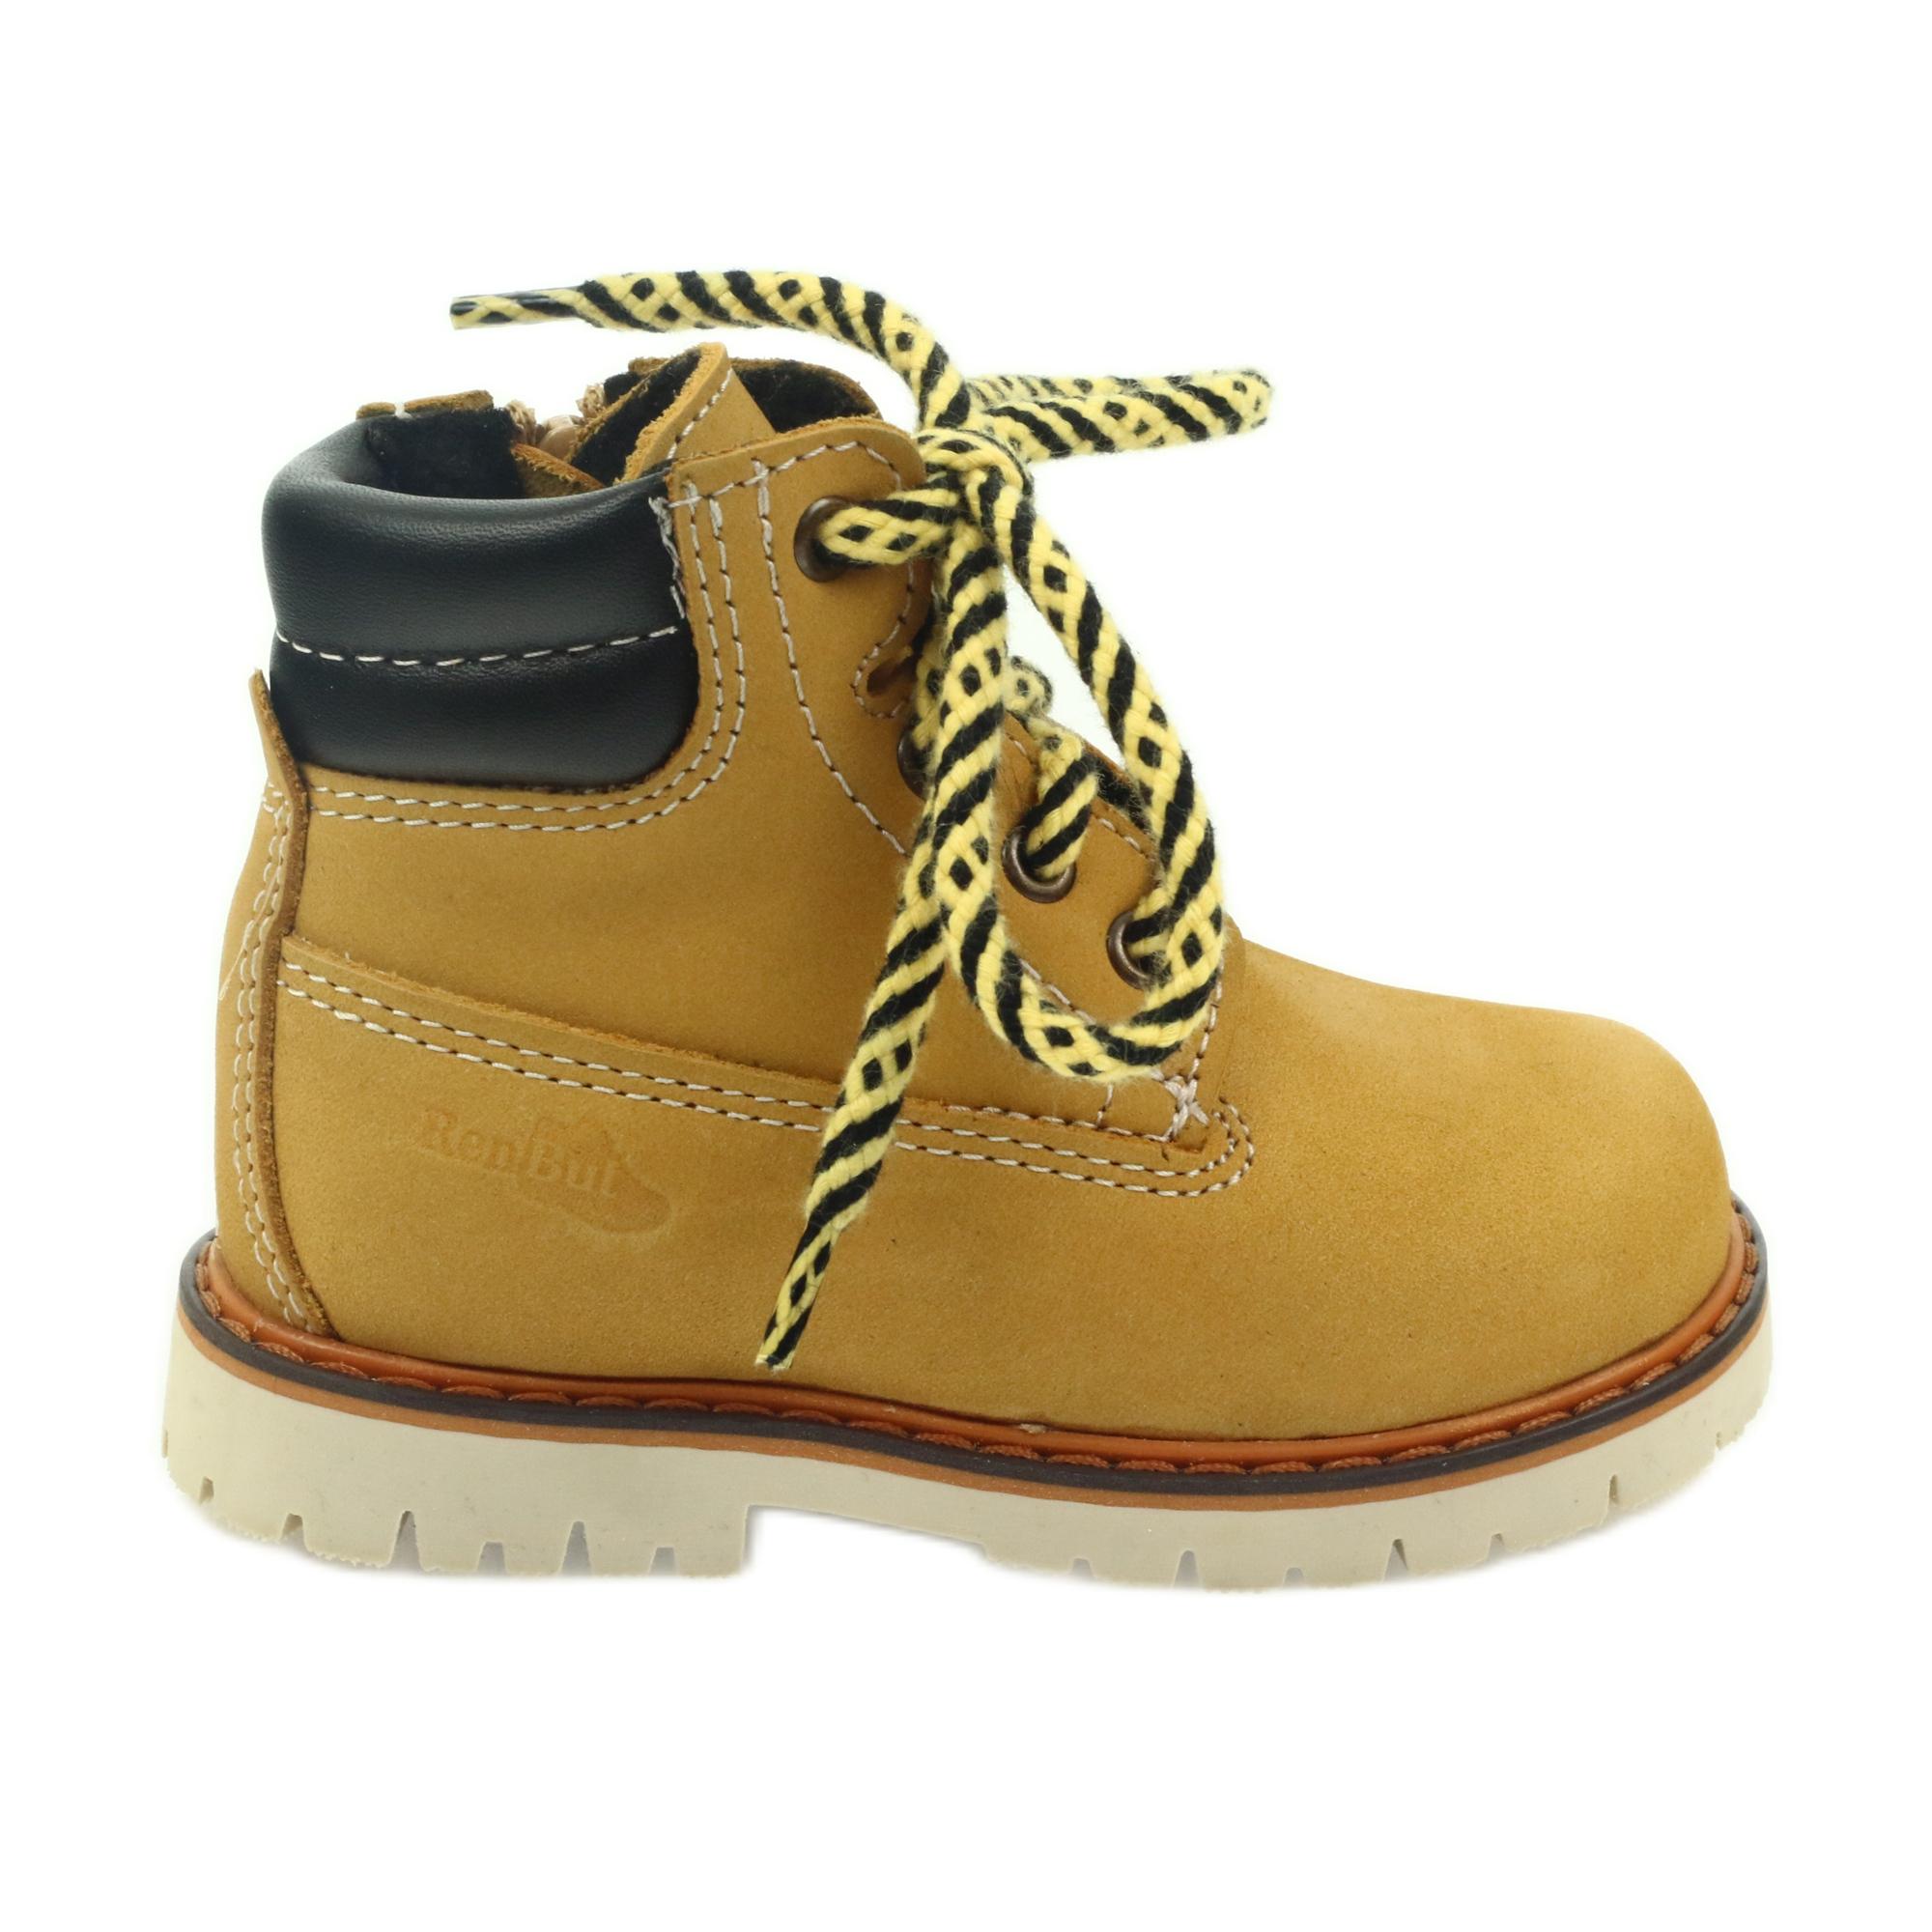 Ren cipzárral rendelkező cipő Ren But 4228 barna ButyModne.pl